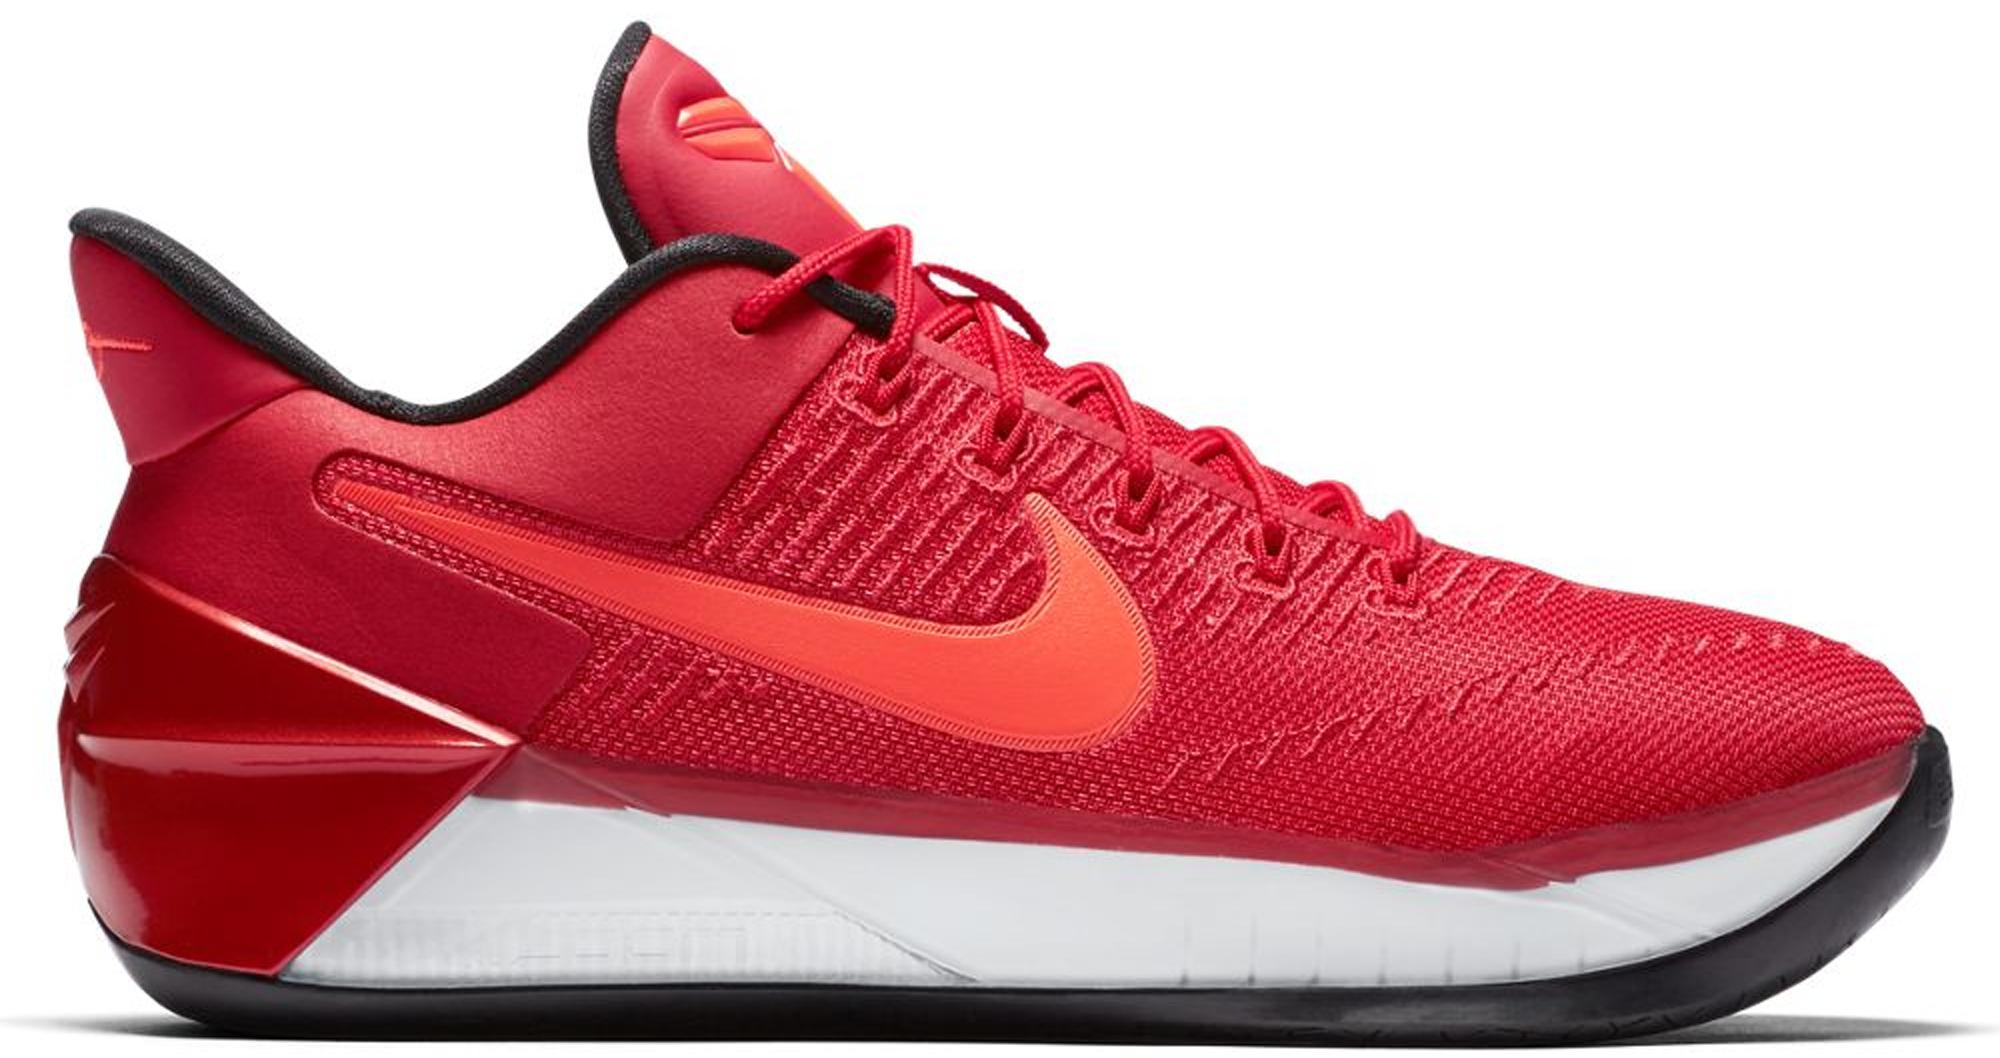 Nike Kobe AD University Red (GS